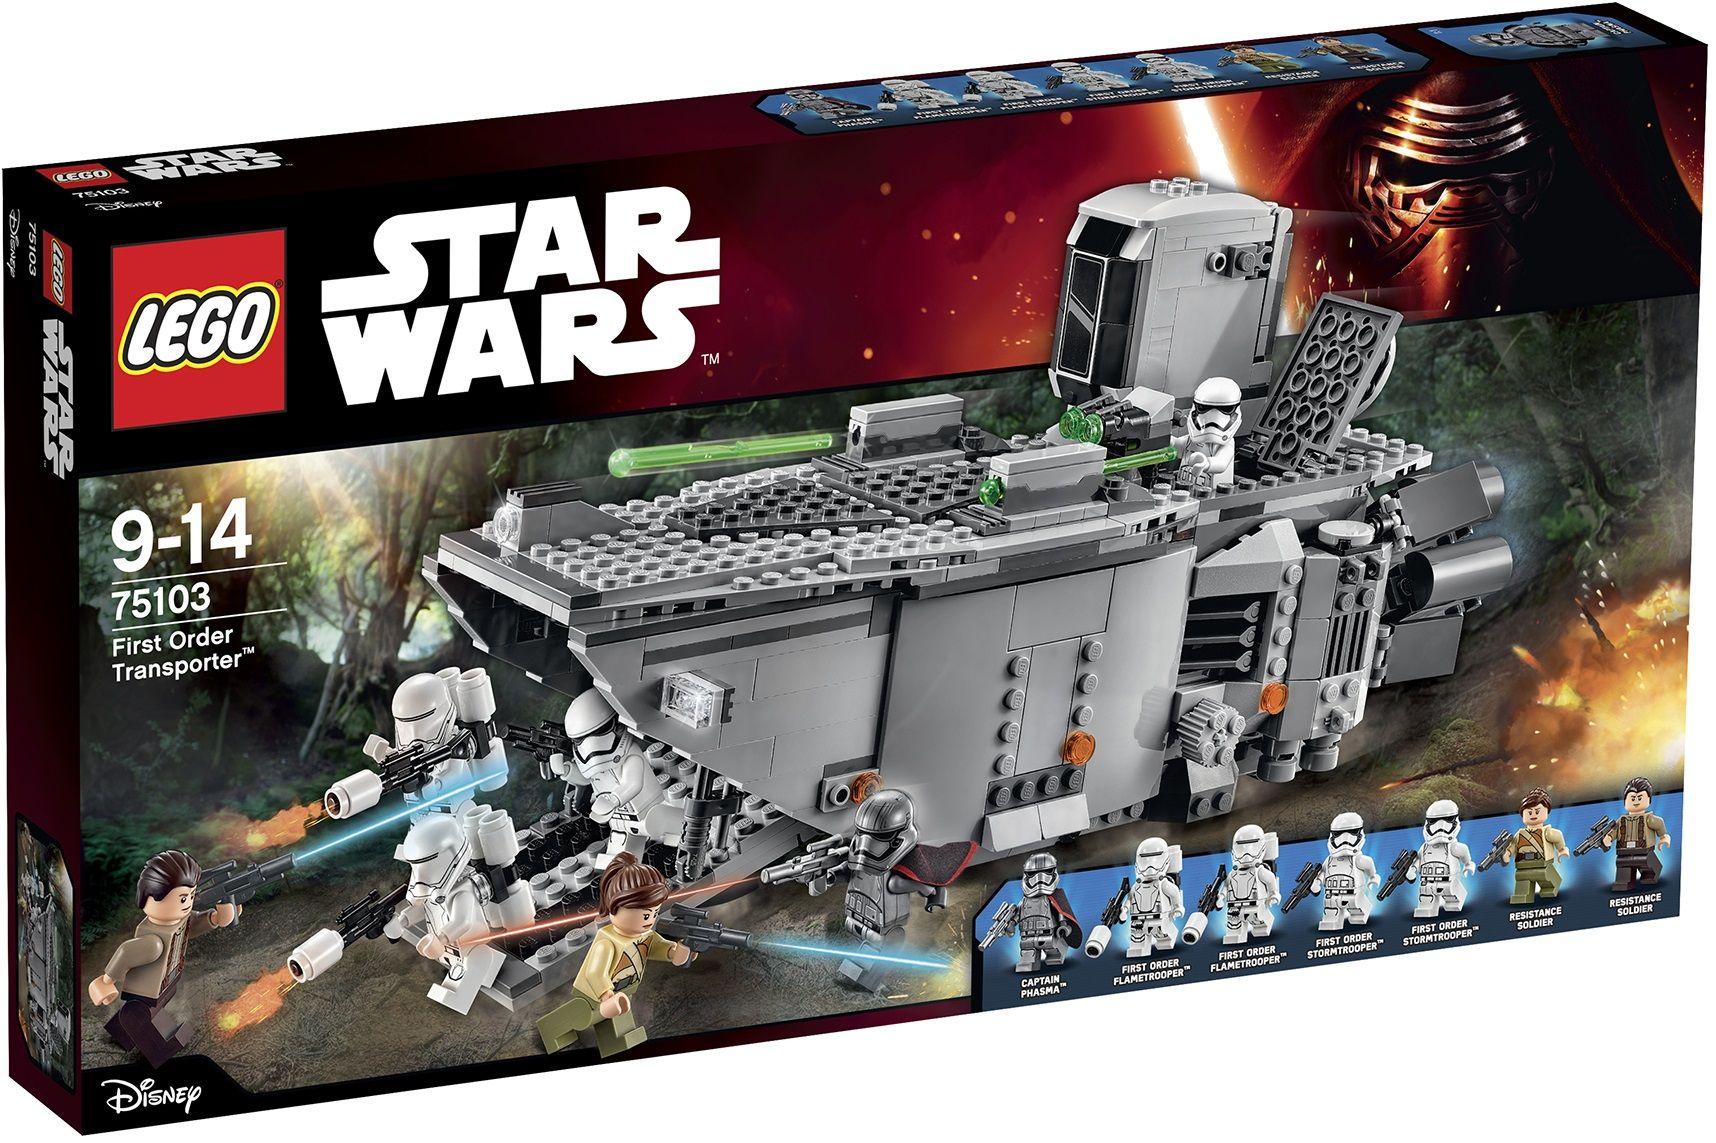 star wars the force awakens neues set von lego dead. Black Bedroom Furniture Sets. Home Design Ideas